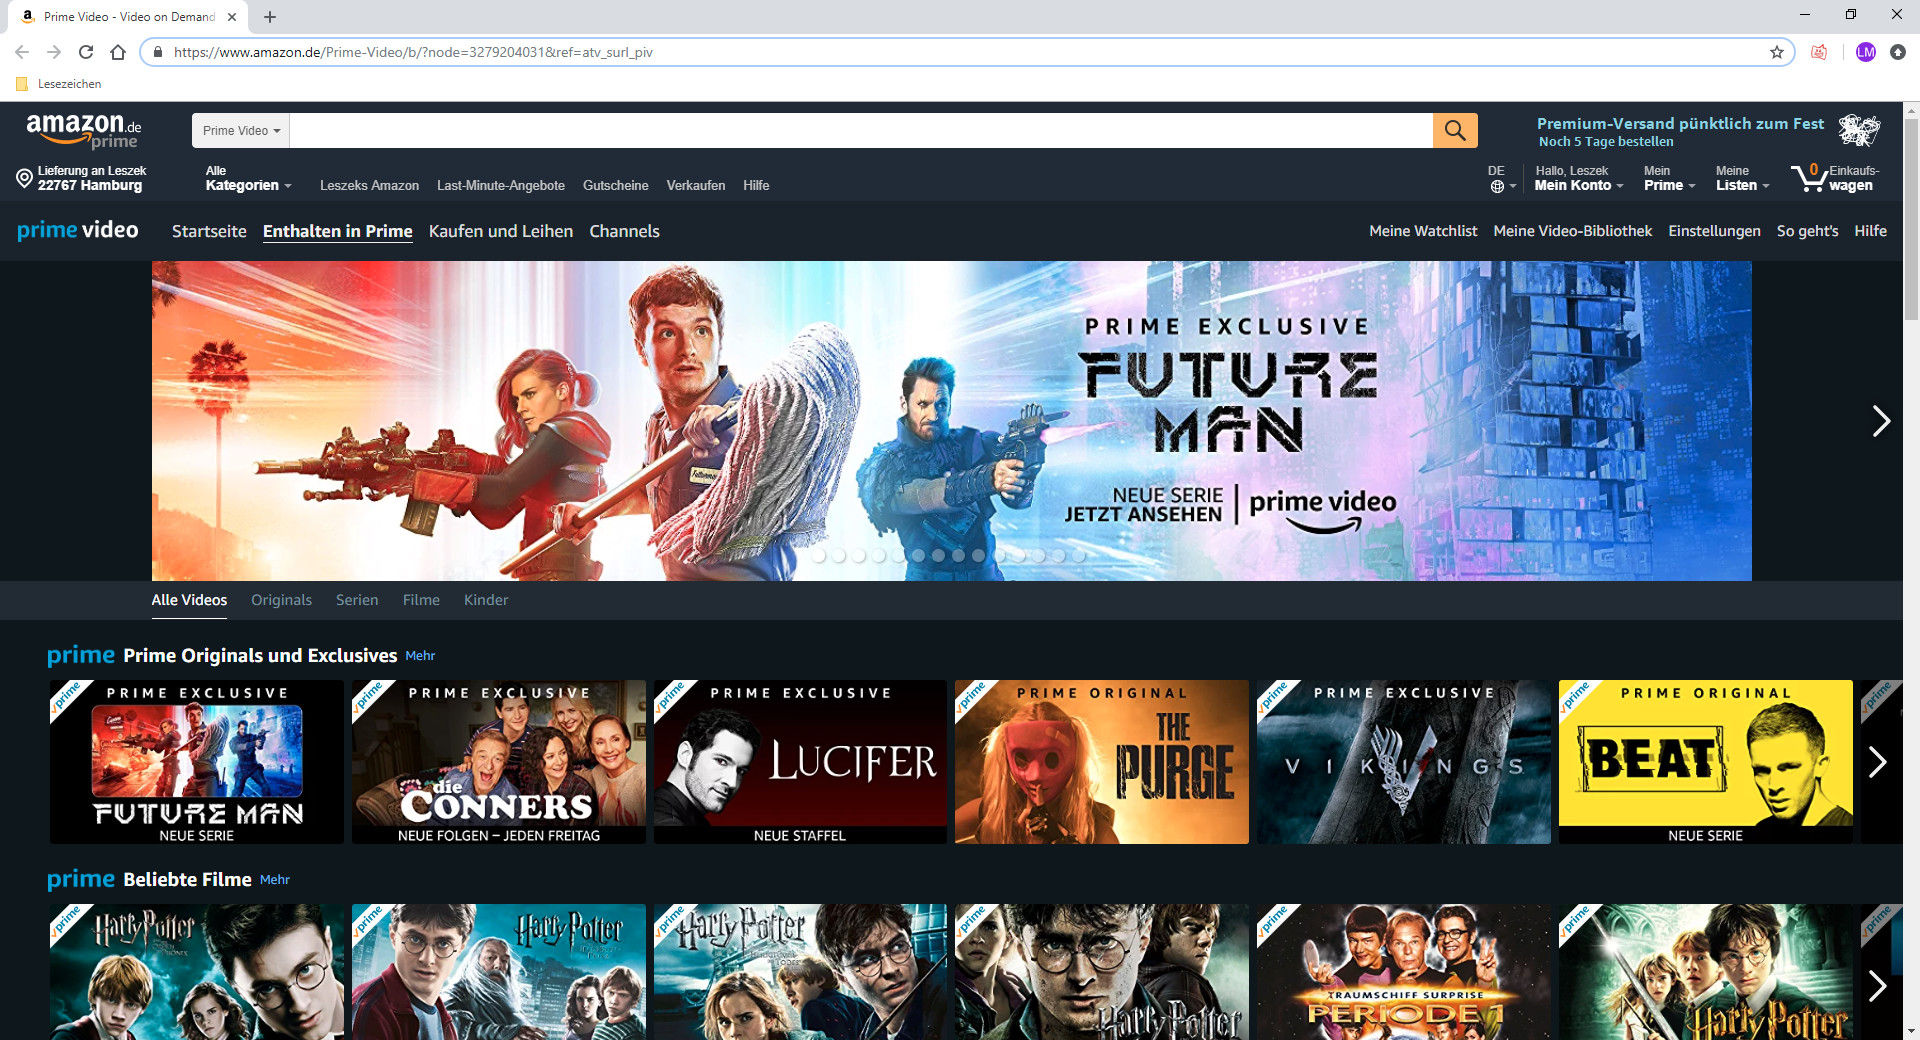 Screenshot 1 - Amazon Prime Video